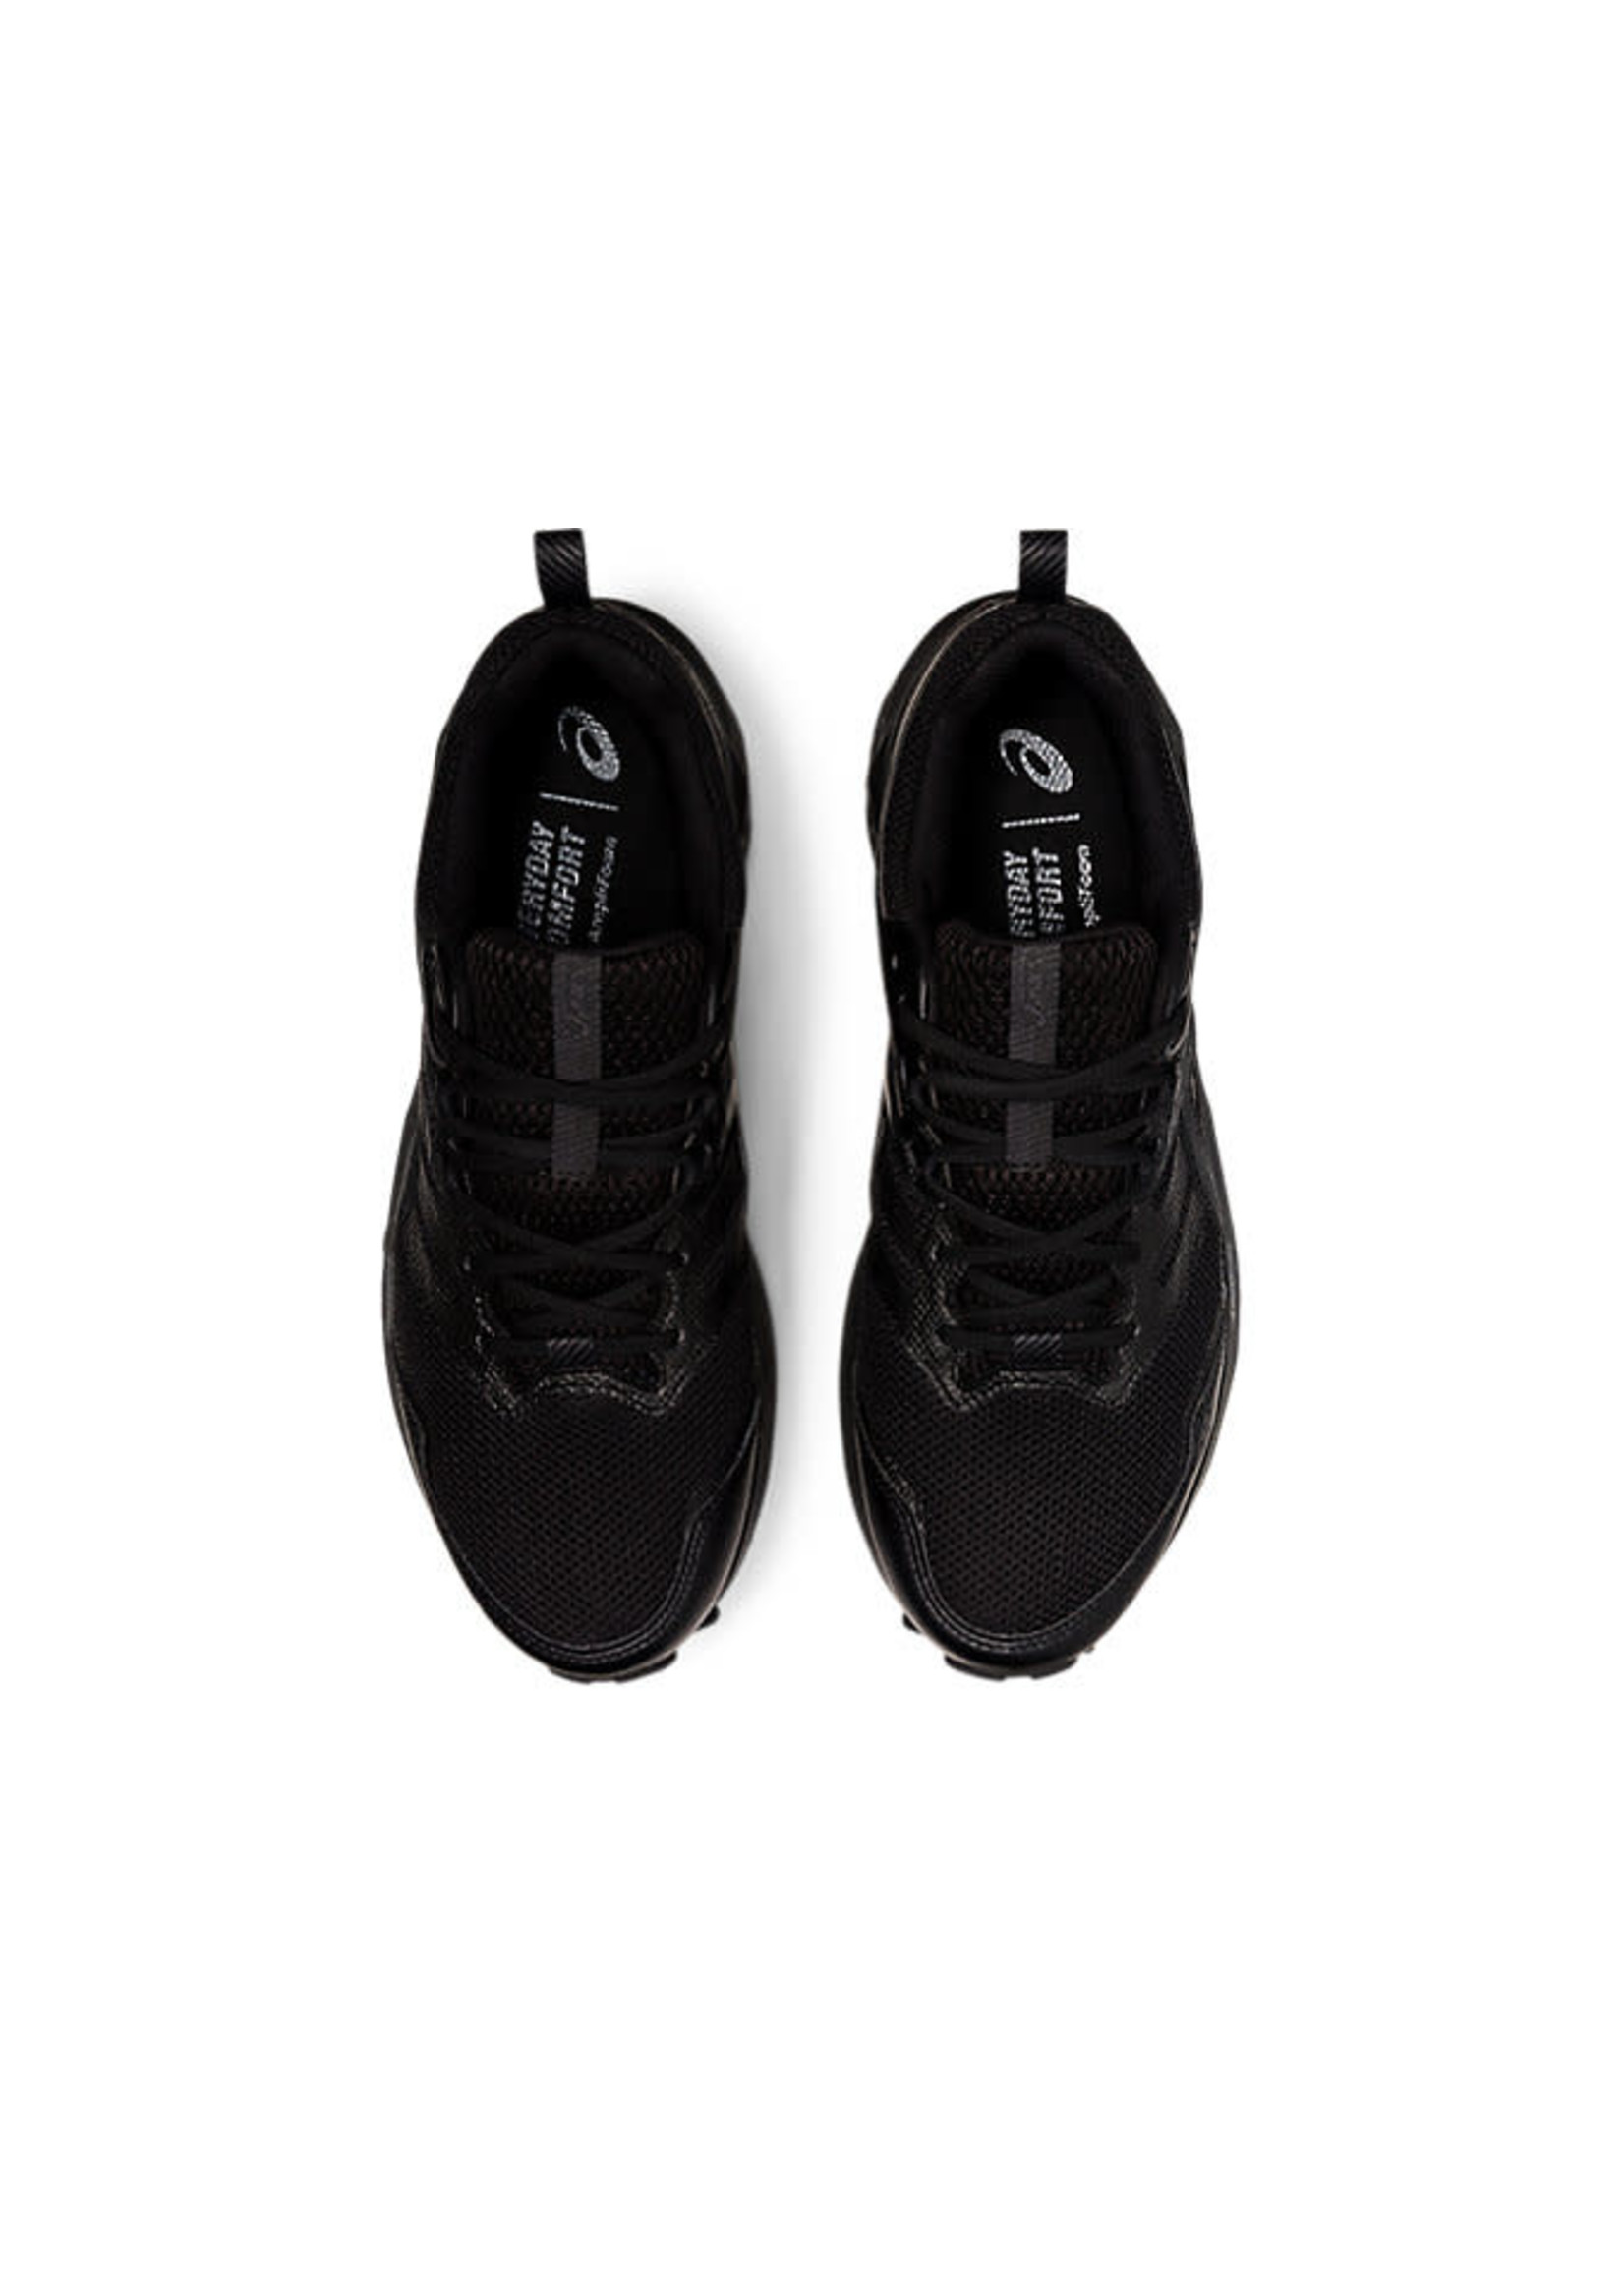 Asics Gel-Sonoma 6 GTX Mens Running Shoe, Black/Black, (2021)